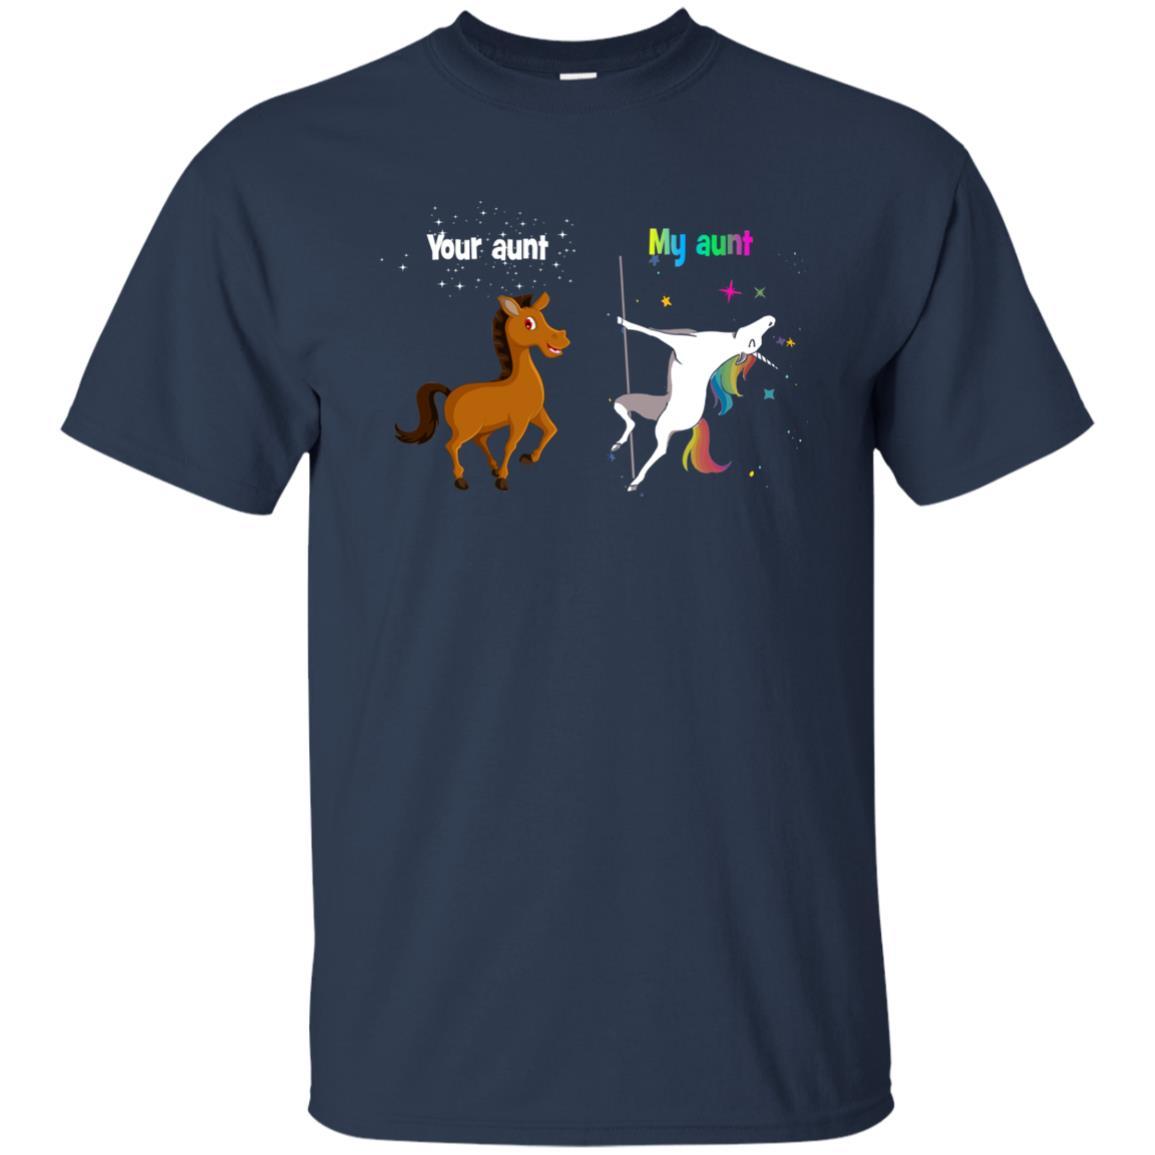 image 934px My aunt unicorn vs your aunt horse t shirt, hoodies, tank top